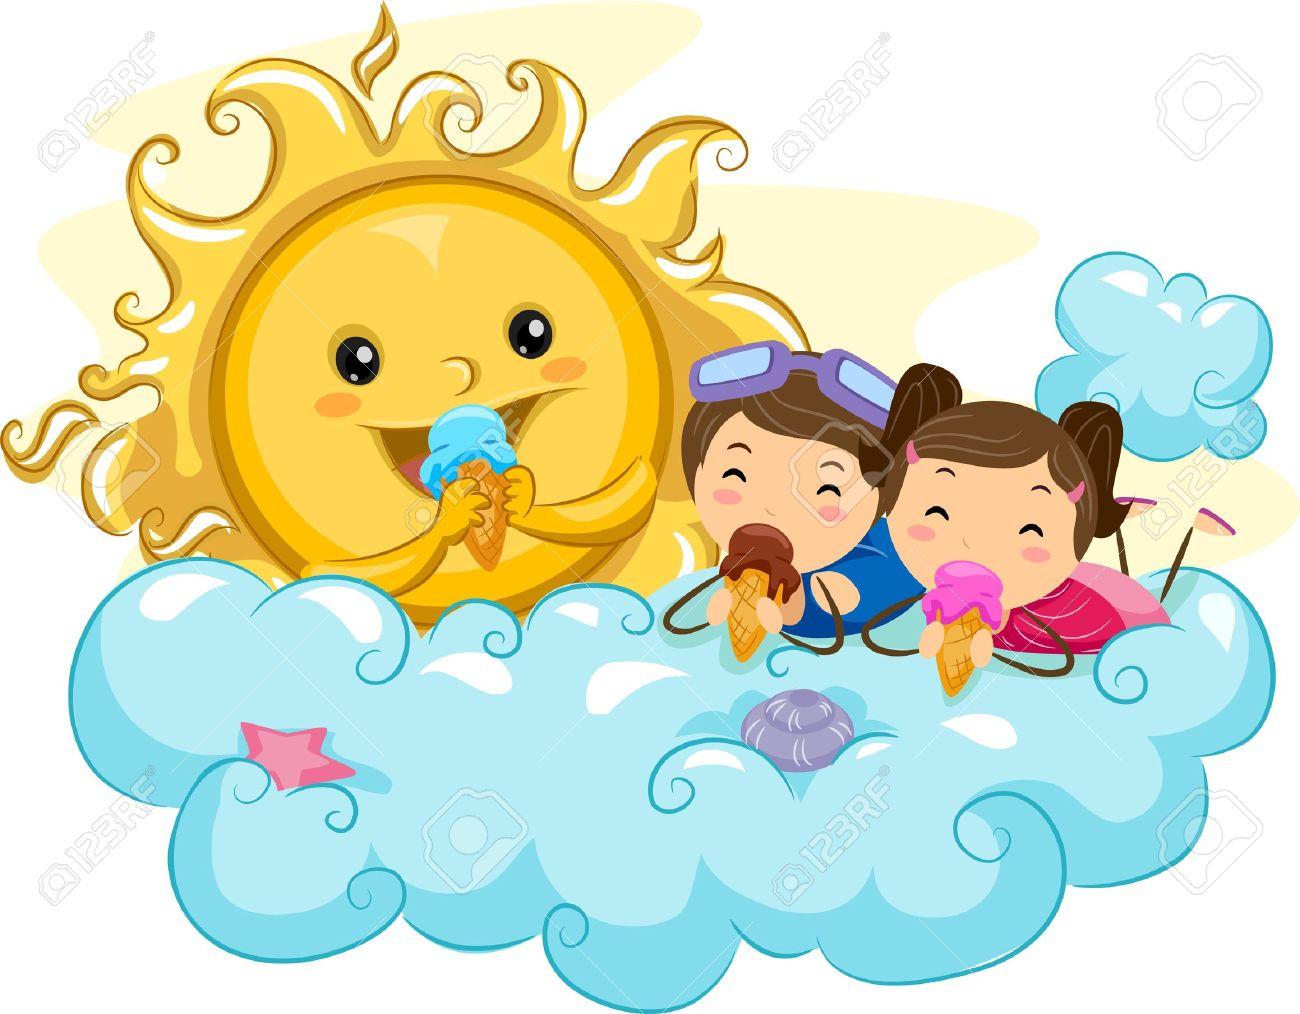 Illustration of Kids Eating Ice Cream with the Sun Stock Illustration - 9915275